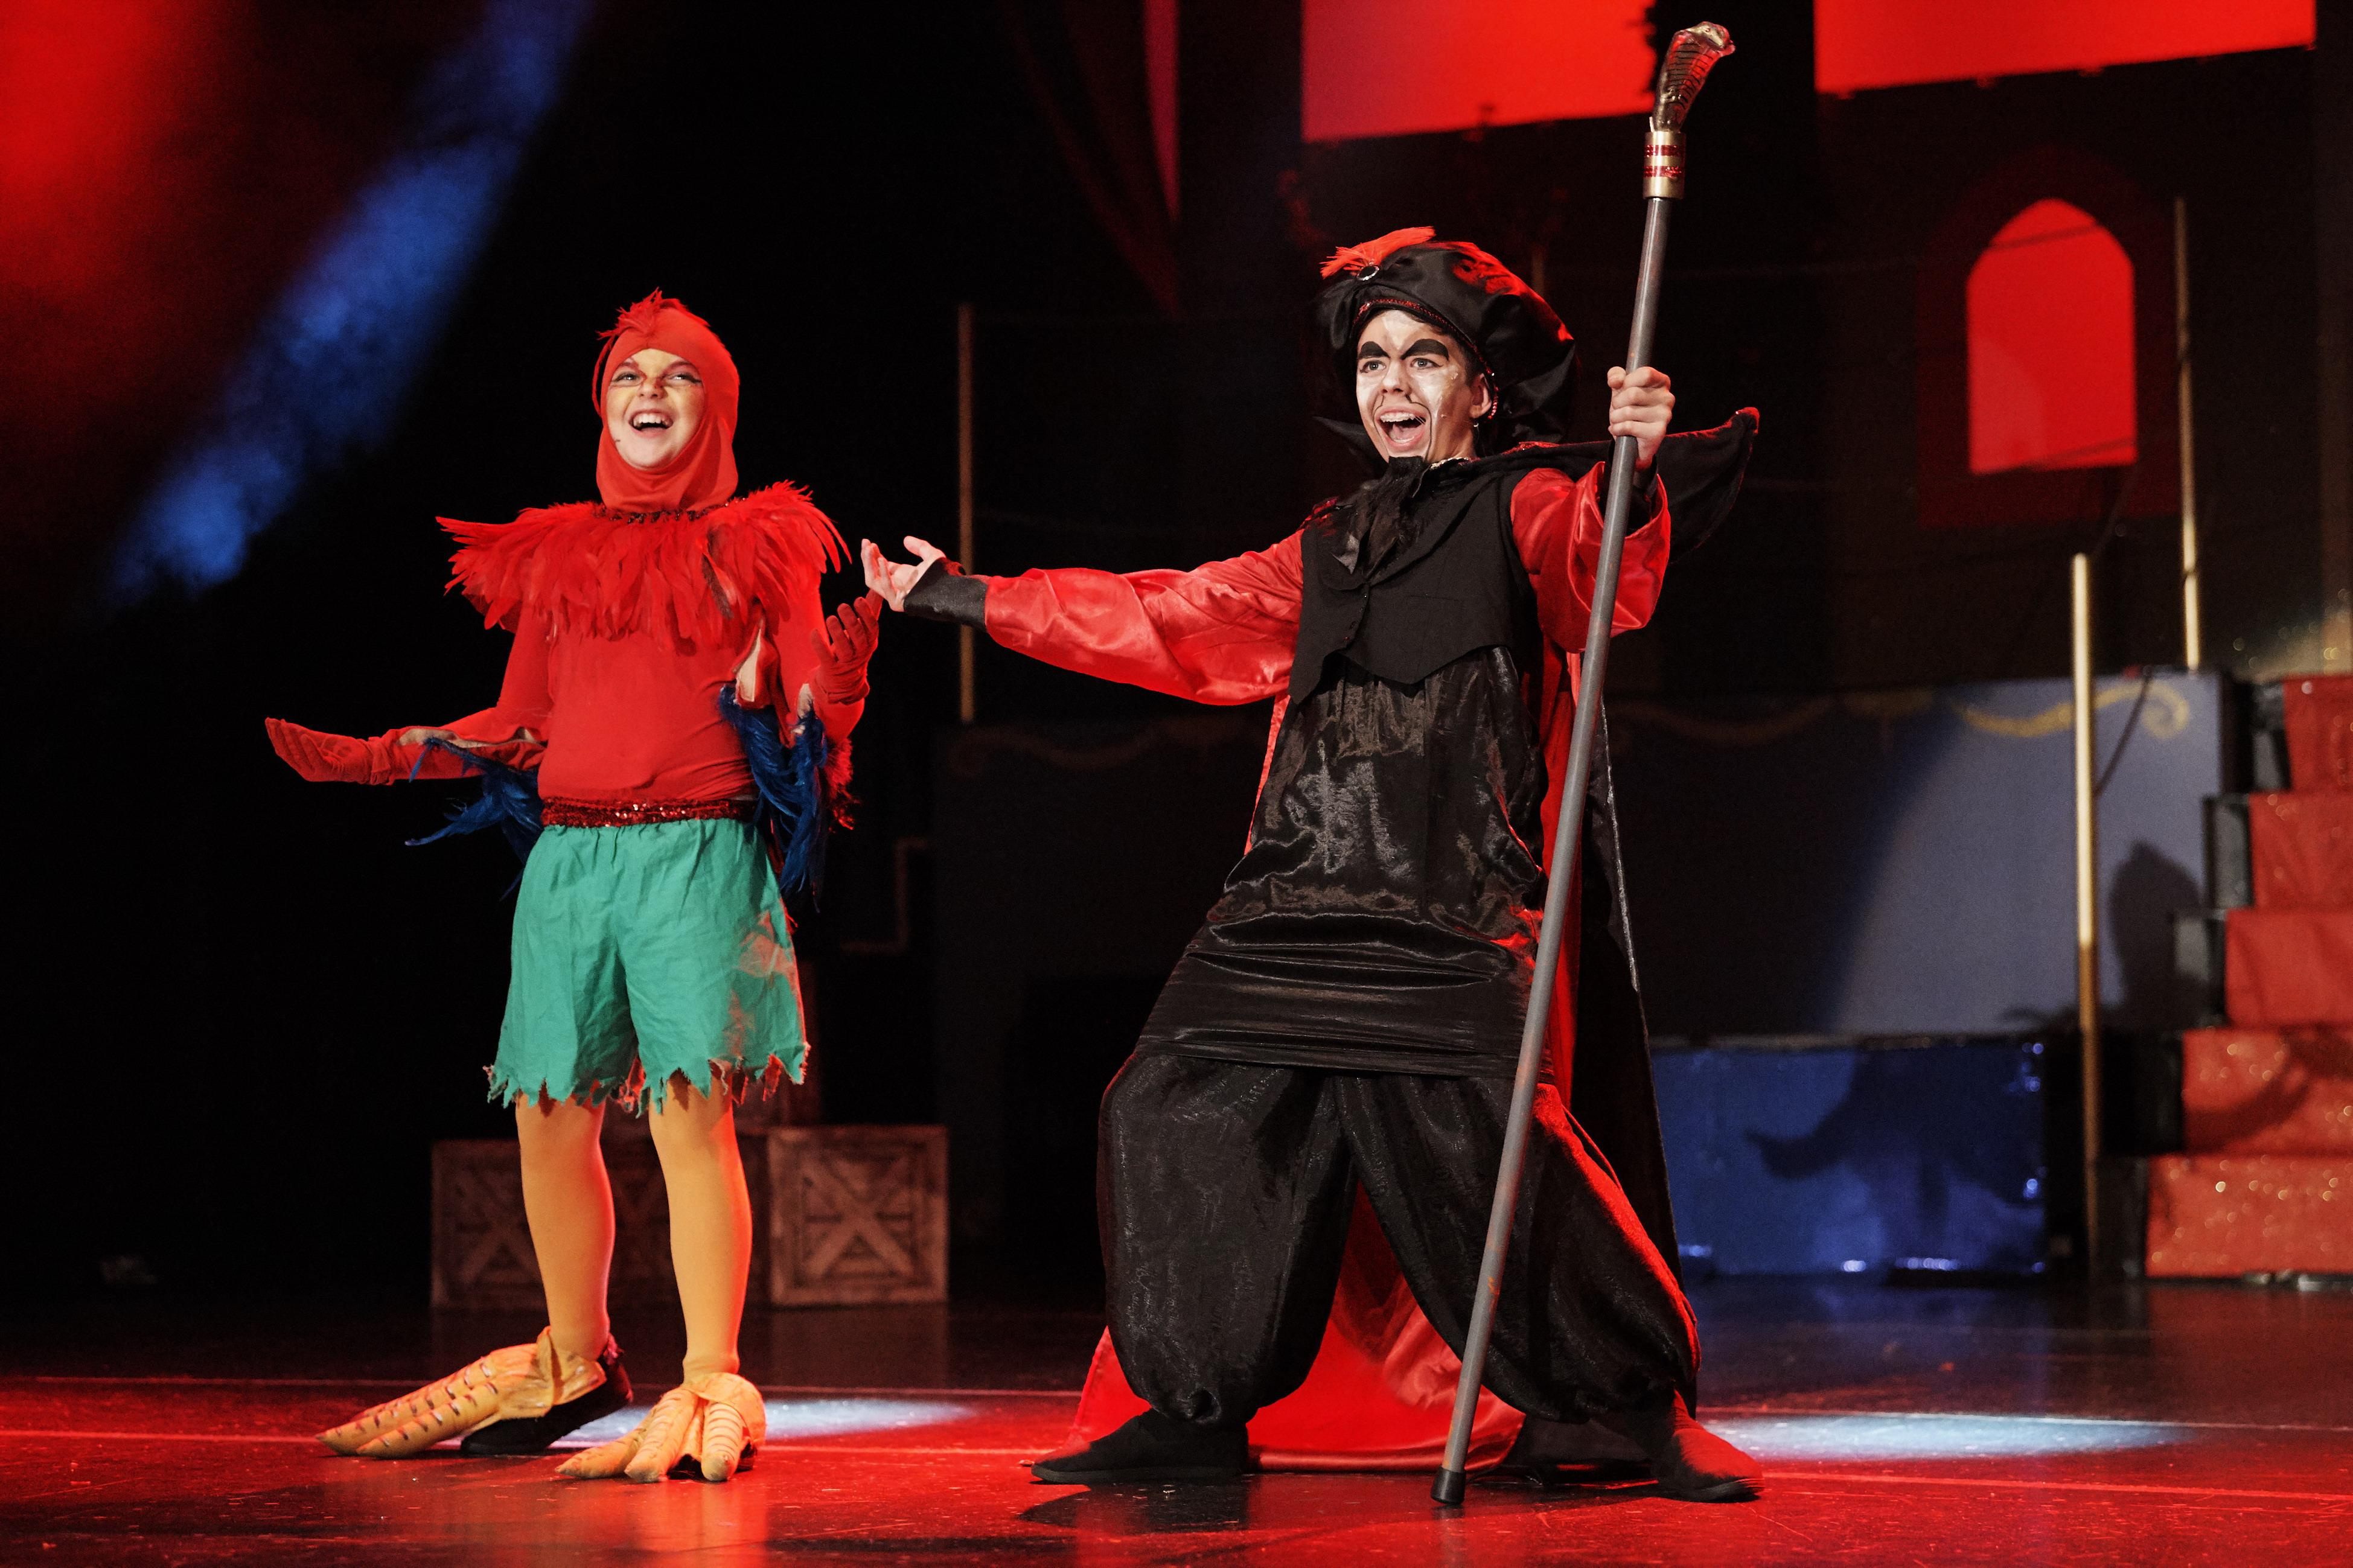 Joel Ruz (Iago) and Blake O'Mara (Jafar) Regals Aladdin Jr Genies cast DSC_8654 2